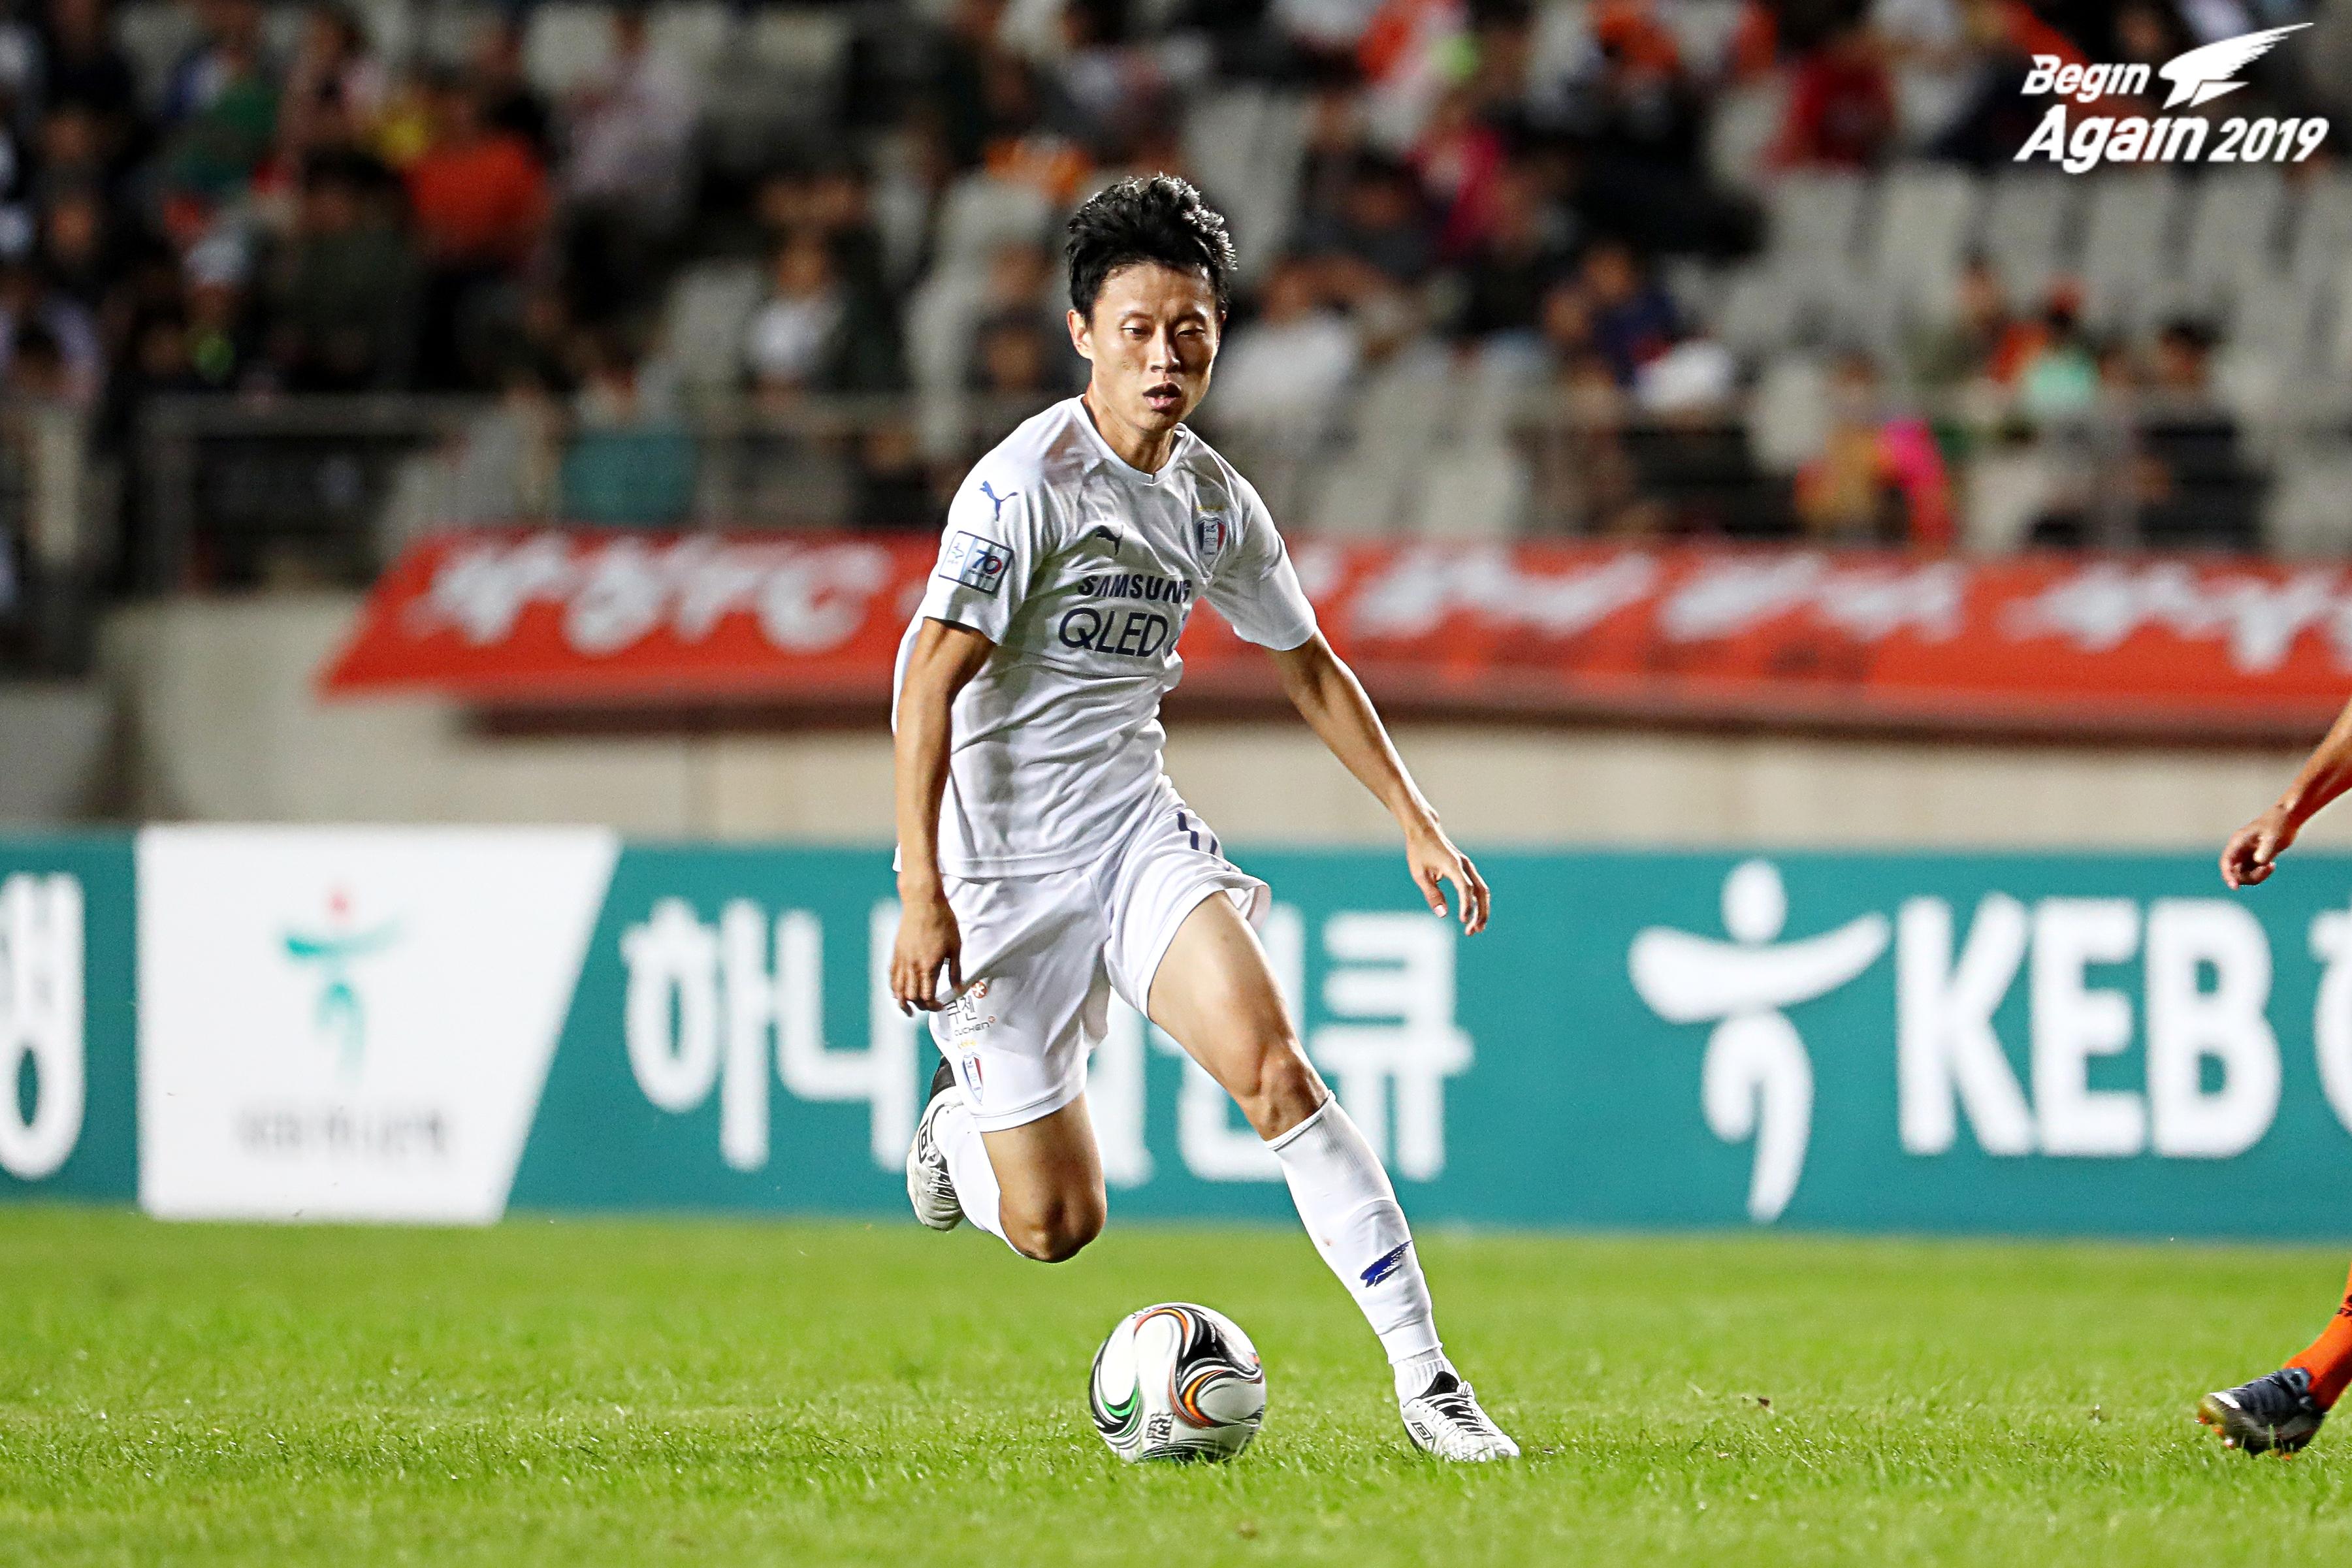 2019-0919-FA컵-화성전-0143.jpg